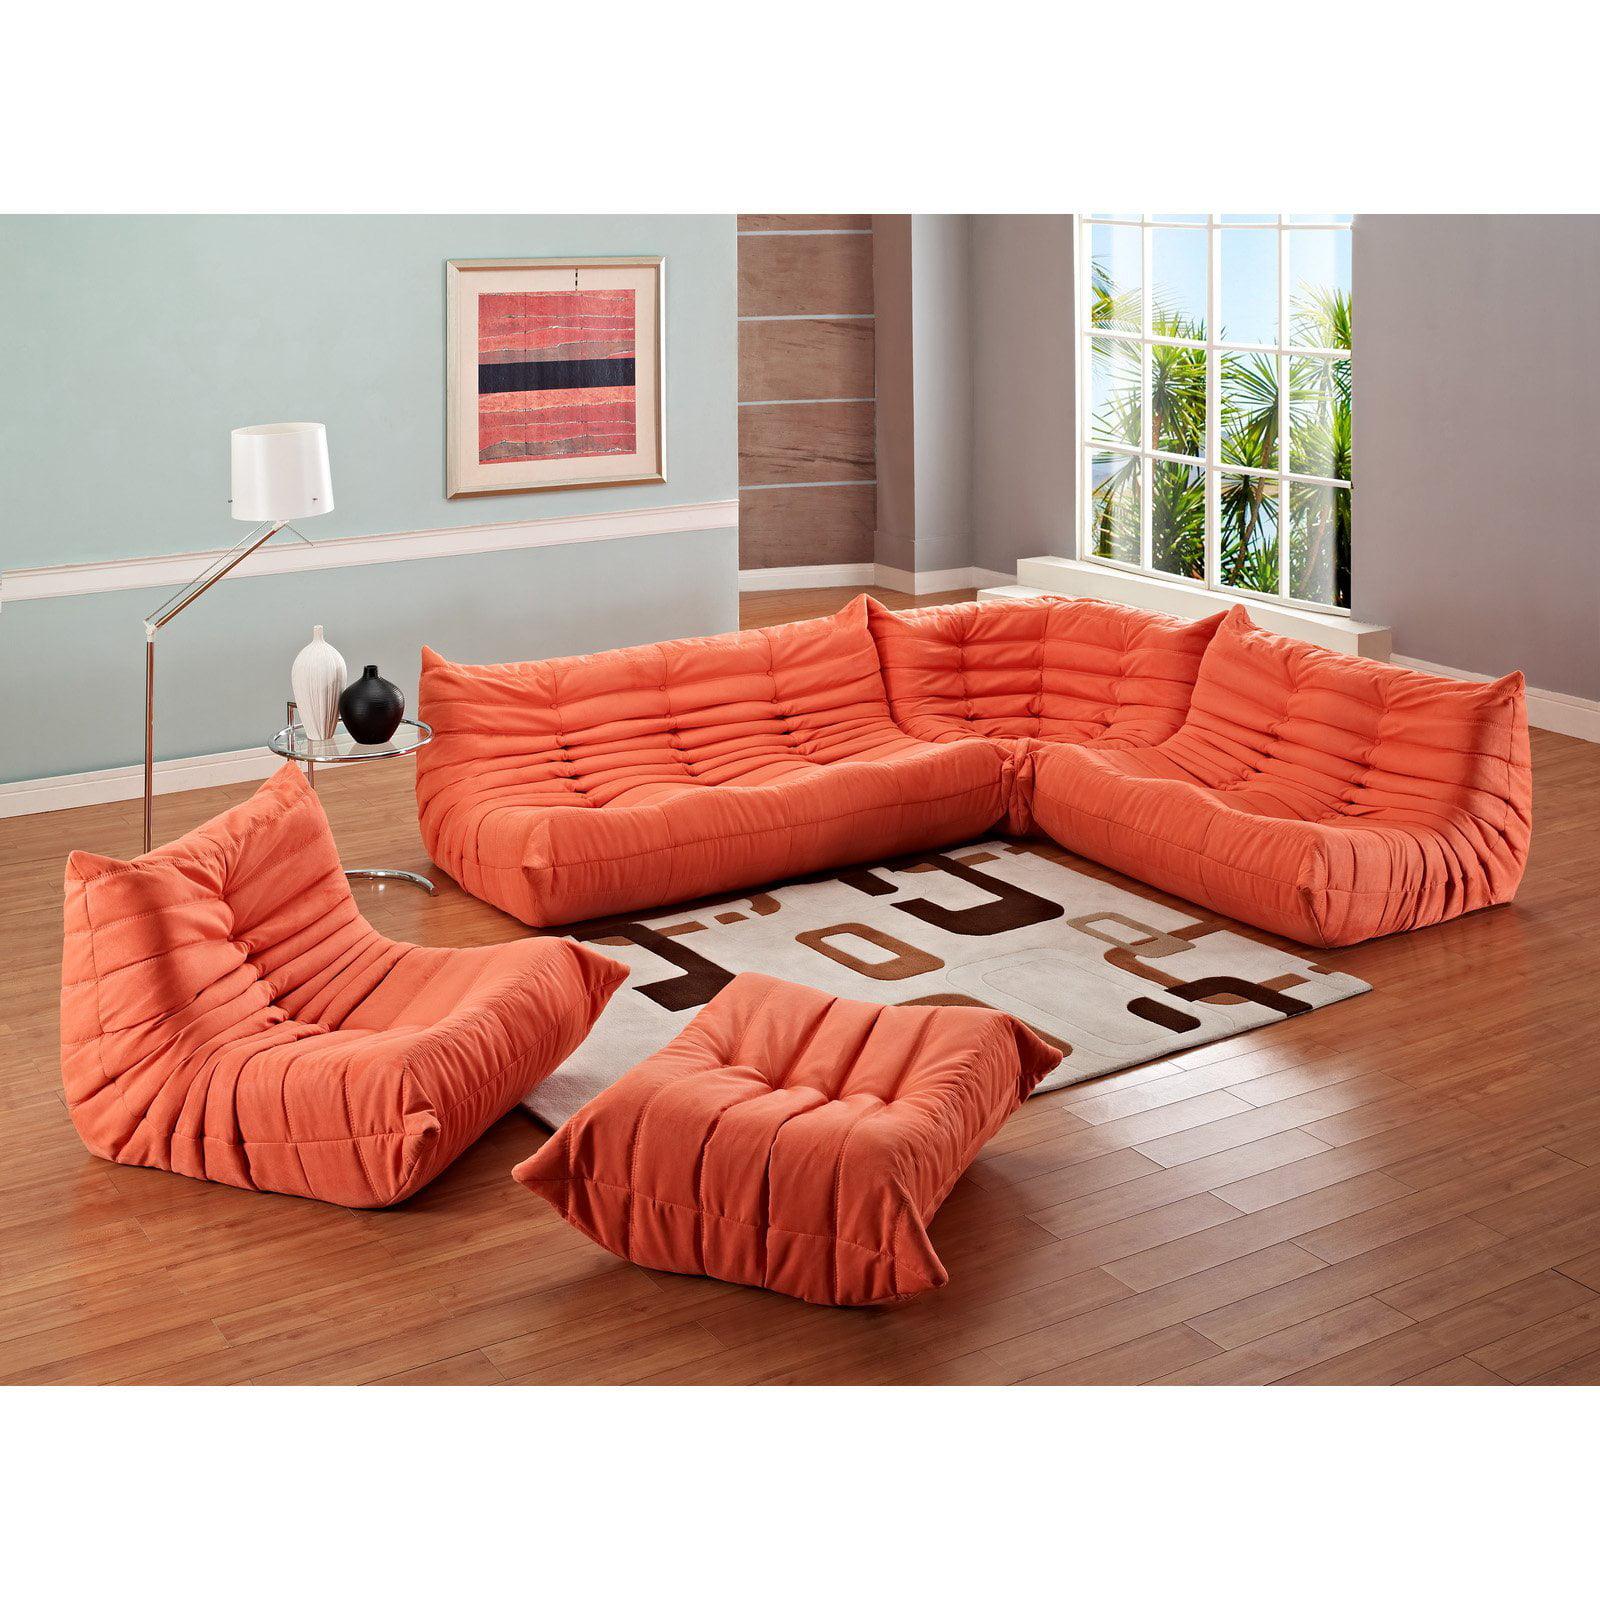 Modway Waverunner Sofa Set Multiple Colors Walmart